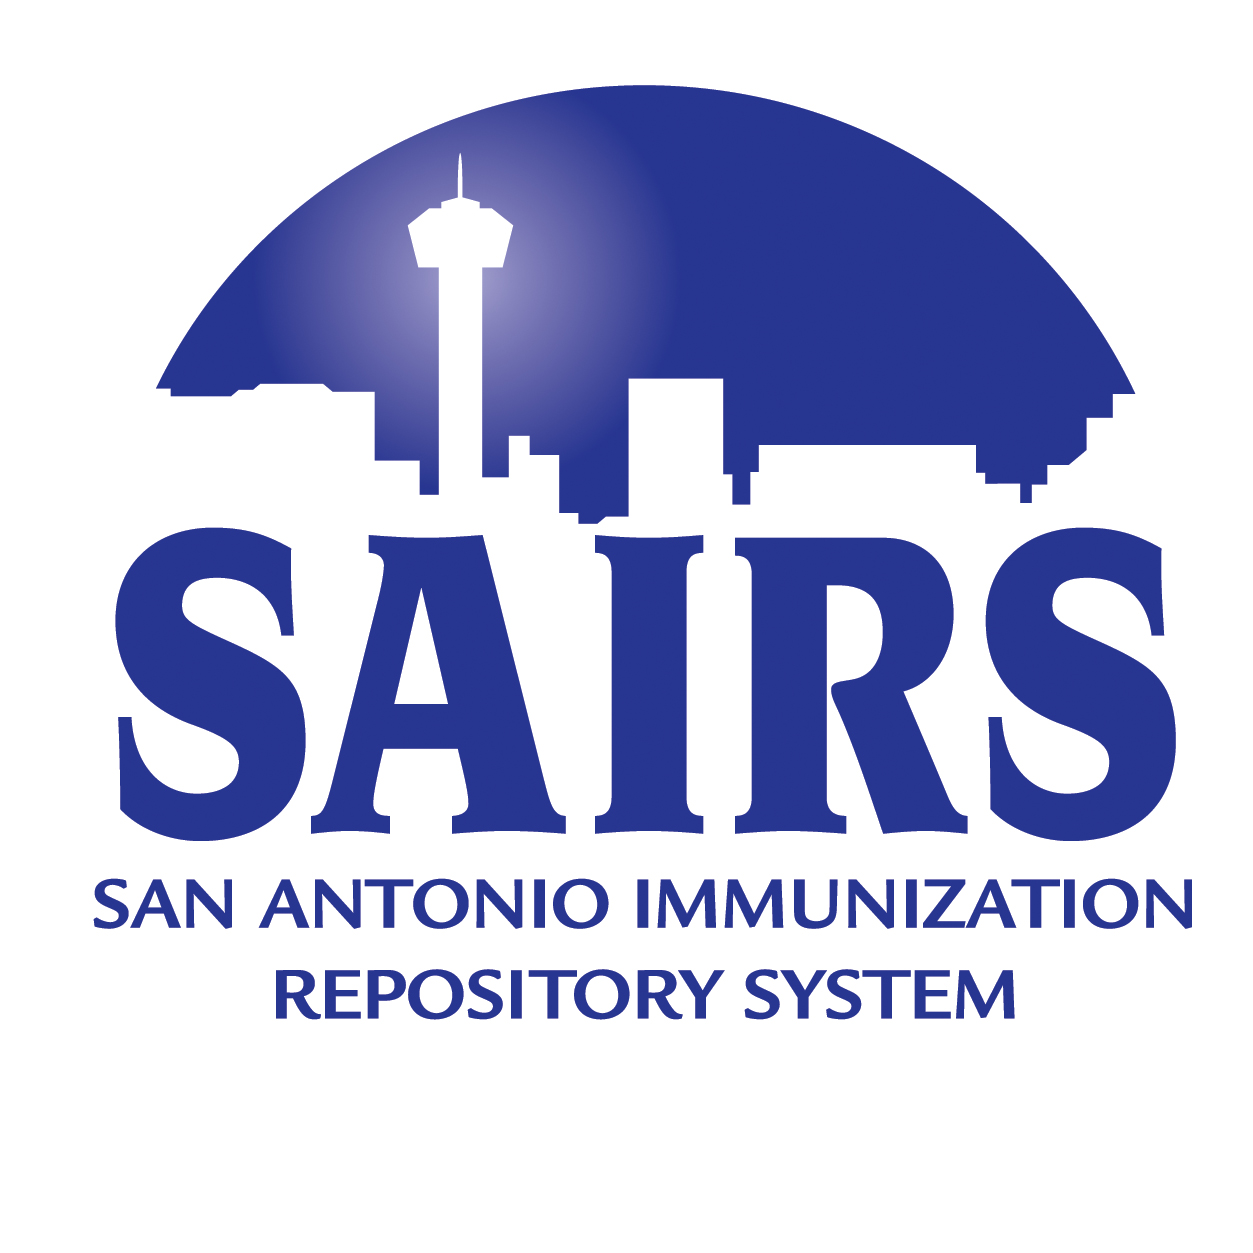 Public Health Service District San Francisco Citizen: SAIRS Immunization Repository